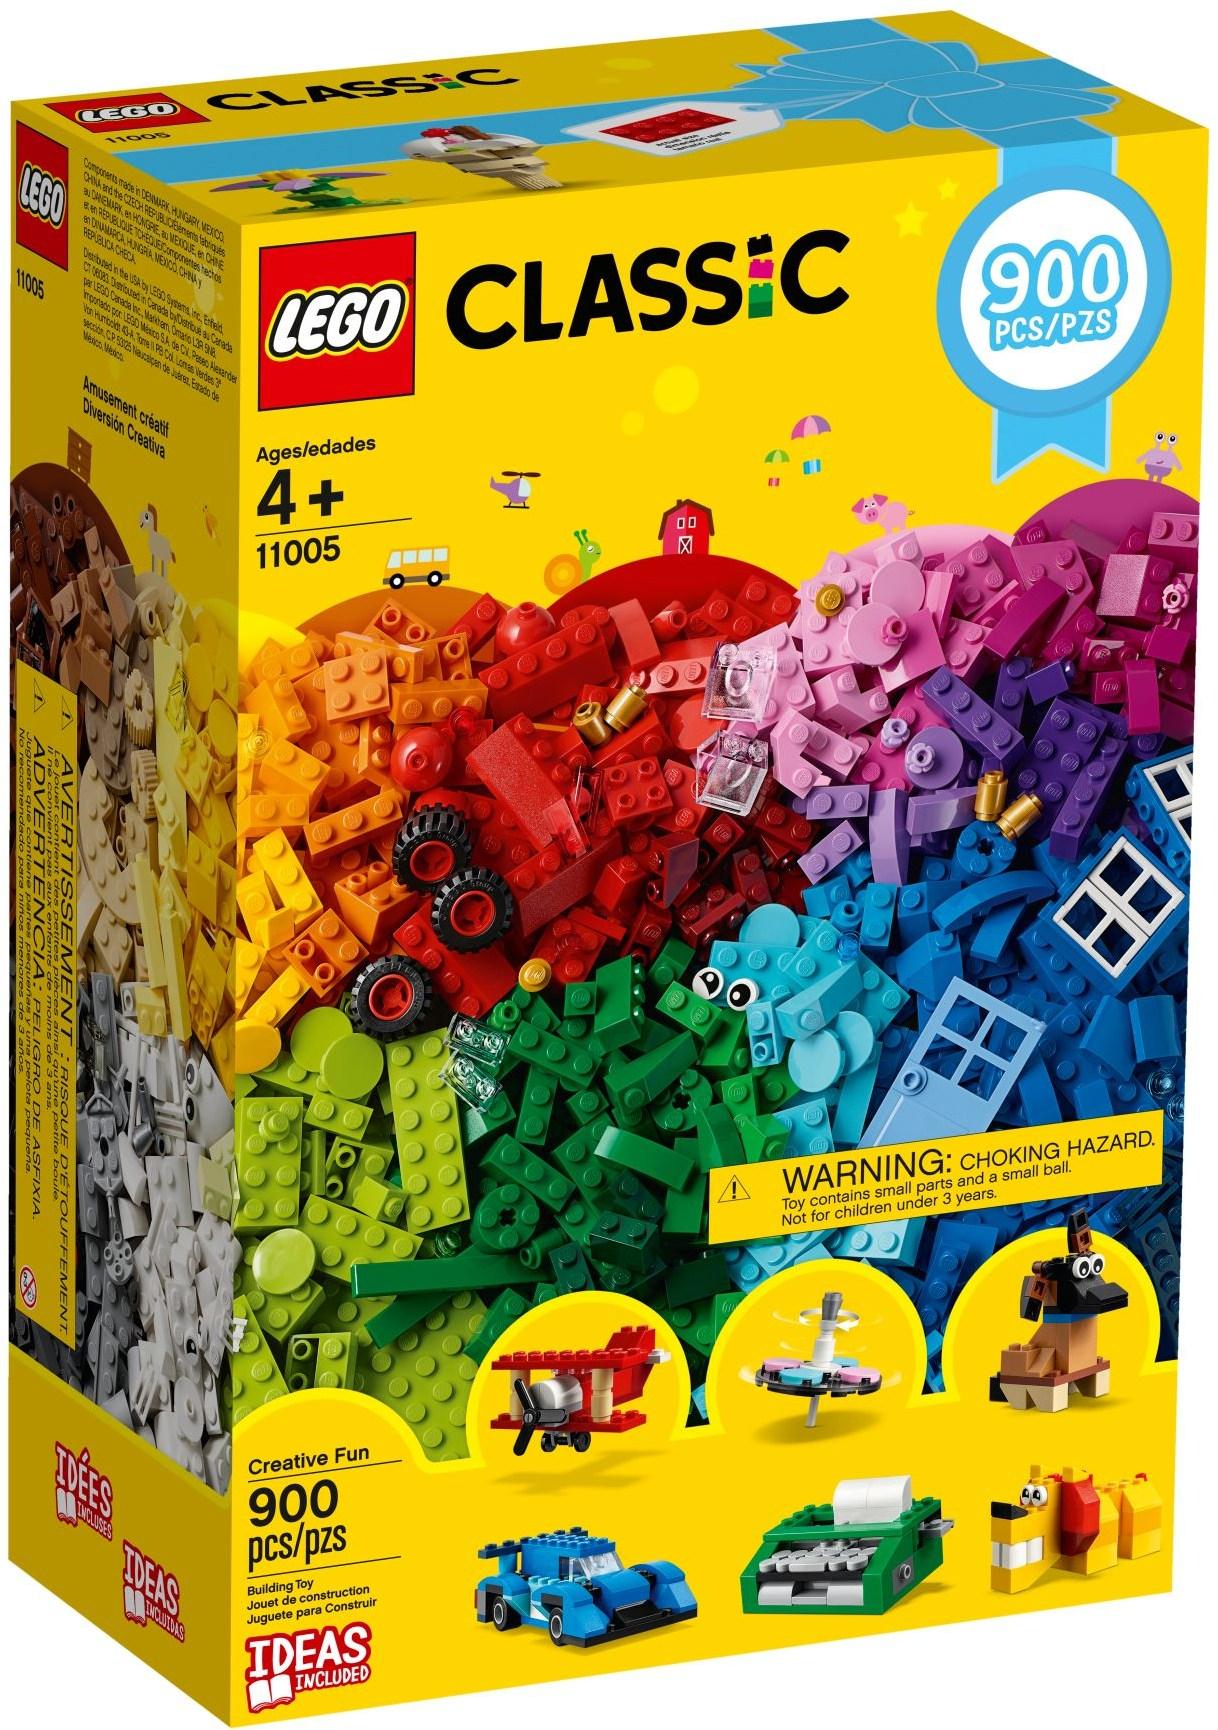 LEGO Walmart Black Friday 2019 Deals - The Brick Fan